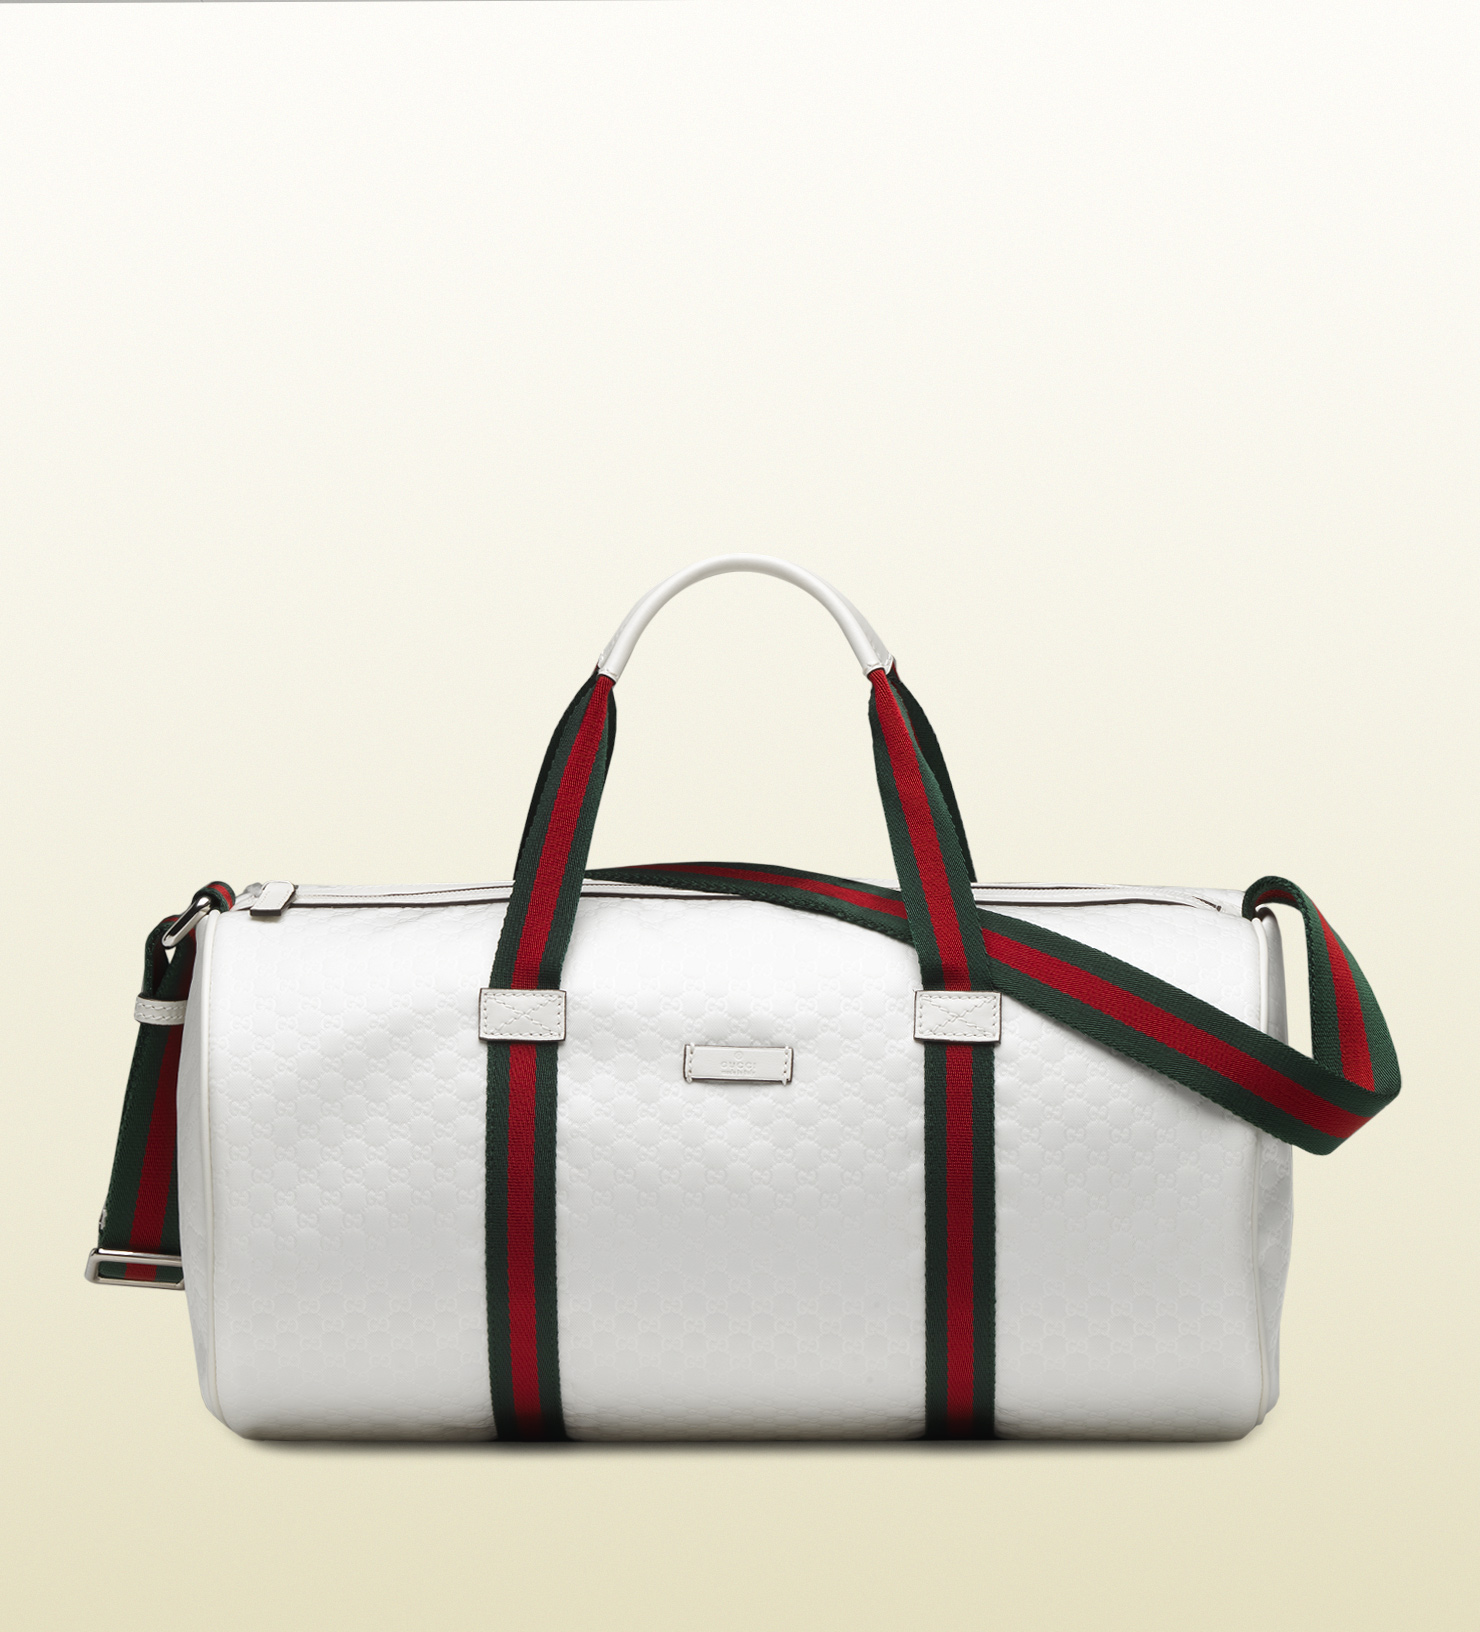 Lyst - Gucci White Micro Gg Nylon Gym Bag in White for Men